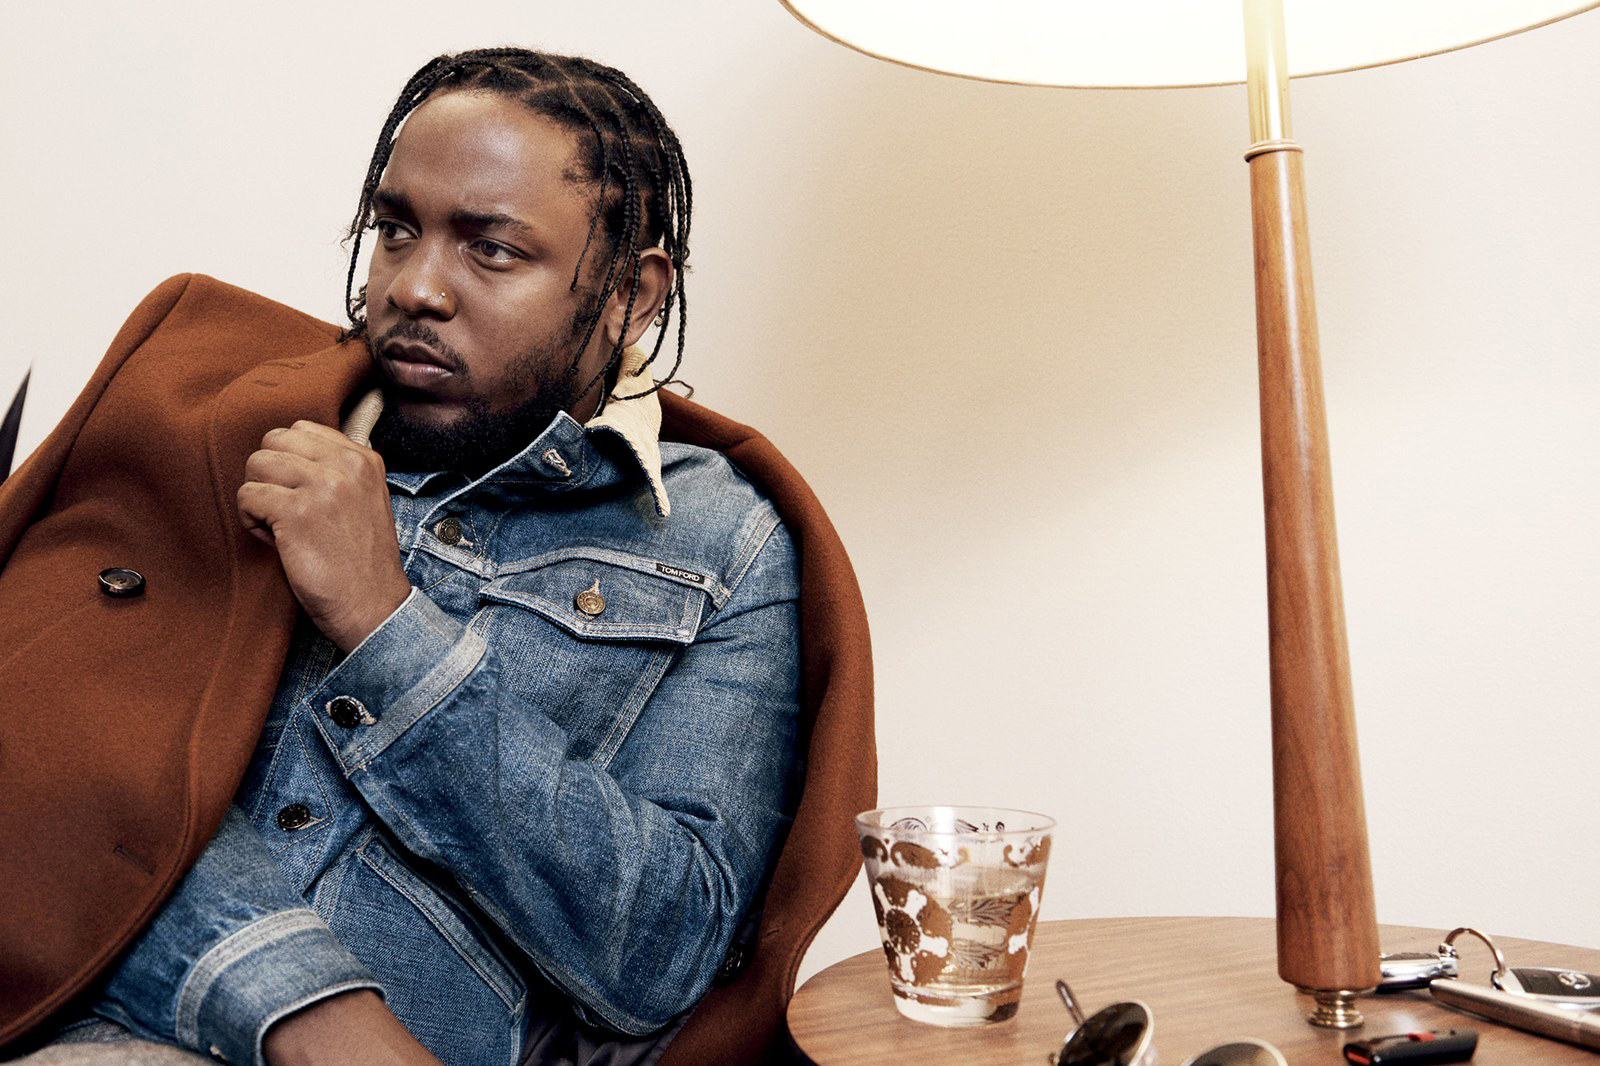 Kendrick Lamar GQ Style Magazine Cover | HYPEBEAST